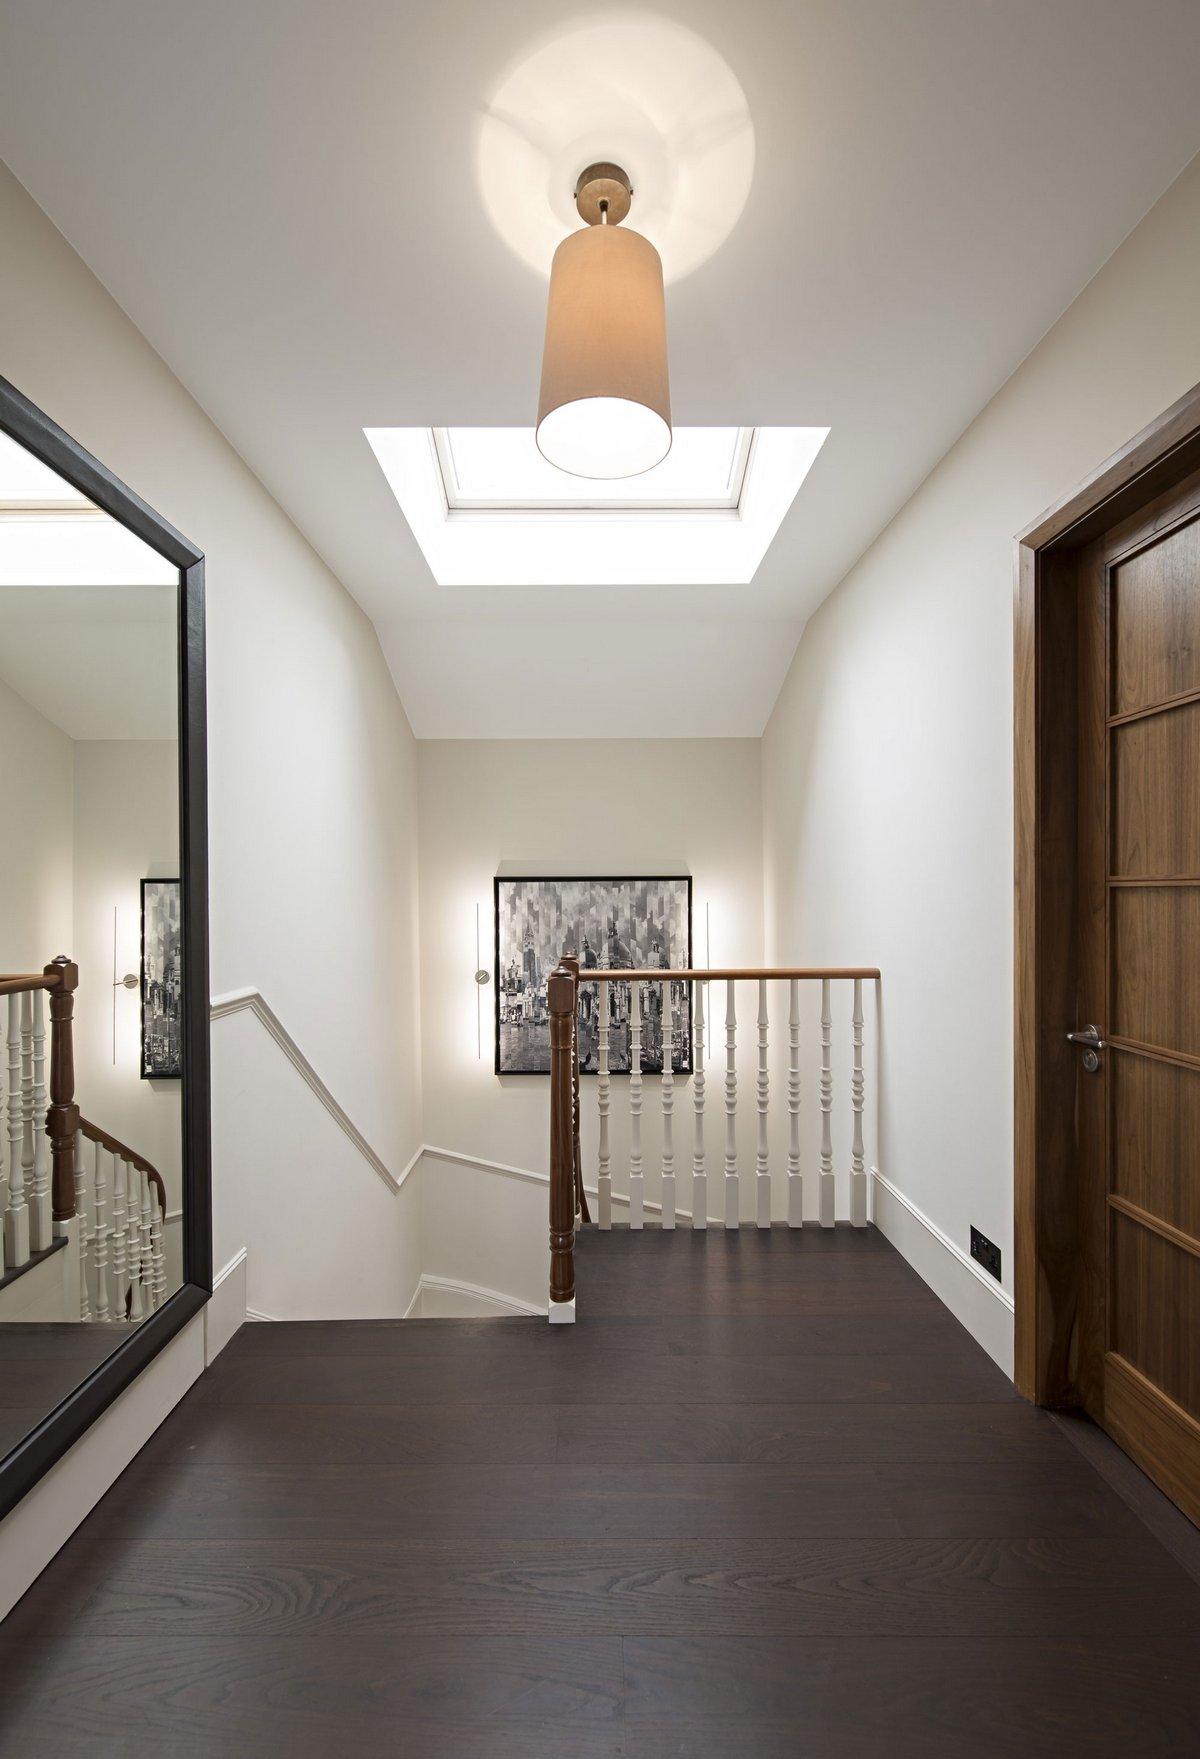 SHH Architects, St John's Wood Villa, камин в частном доме фото, лестница в частном доме фото, винтовая лестница фото, дизайн спальной комнаты фото